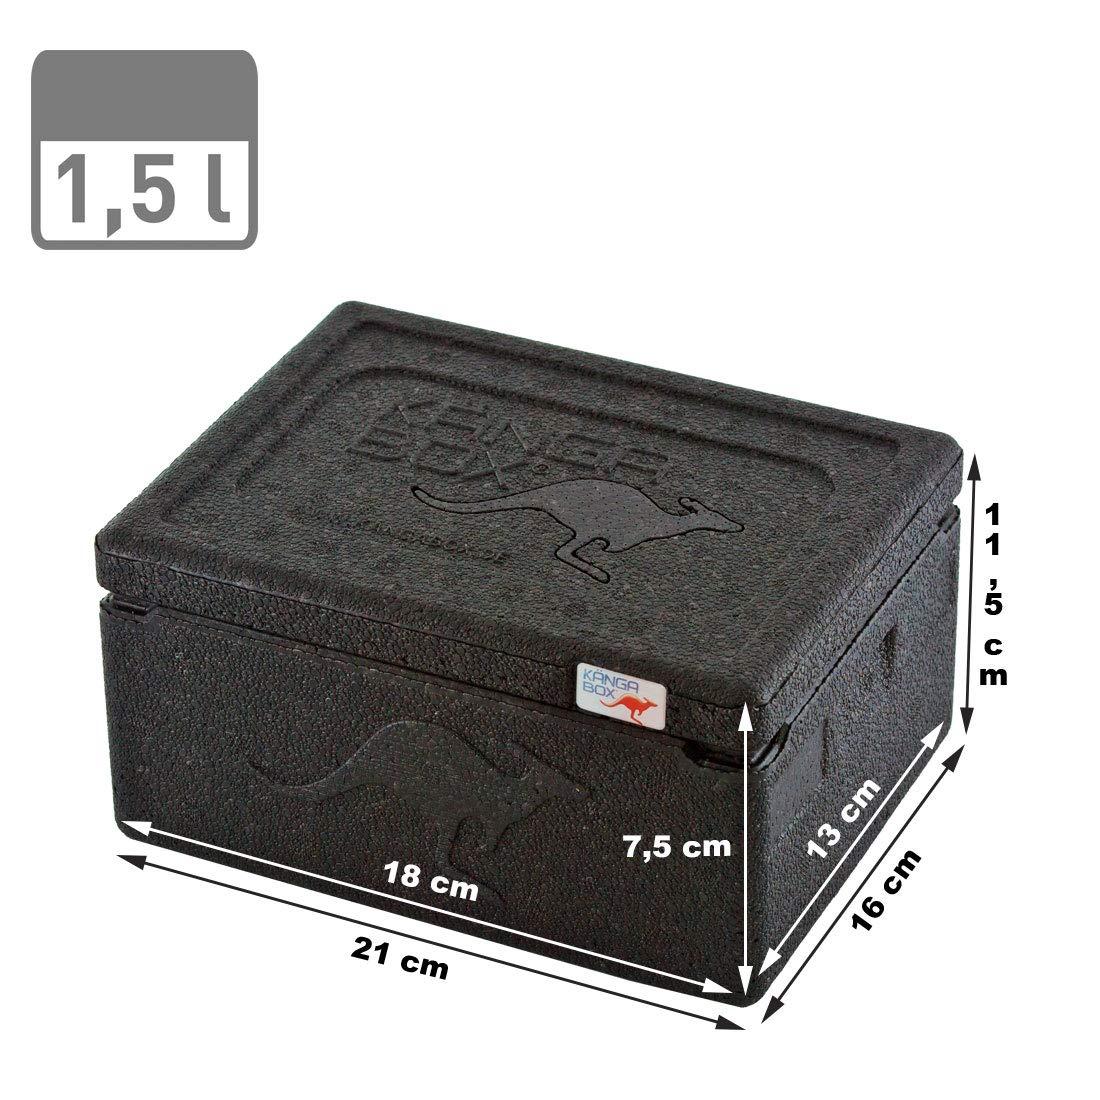 KängaBox Mini EX3075 - Caja térmica (15 L), mantiene el frío y el calor, (exterior 210 x 160 x 115 mm, interior 180 x 130 x 75 mm) rojo rojo: Amazon.es: Deportes y aire libre